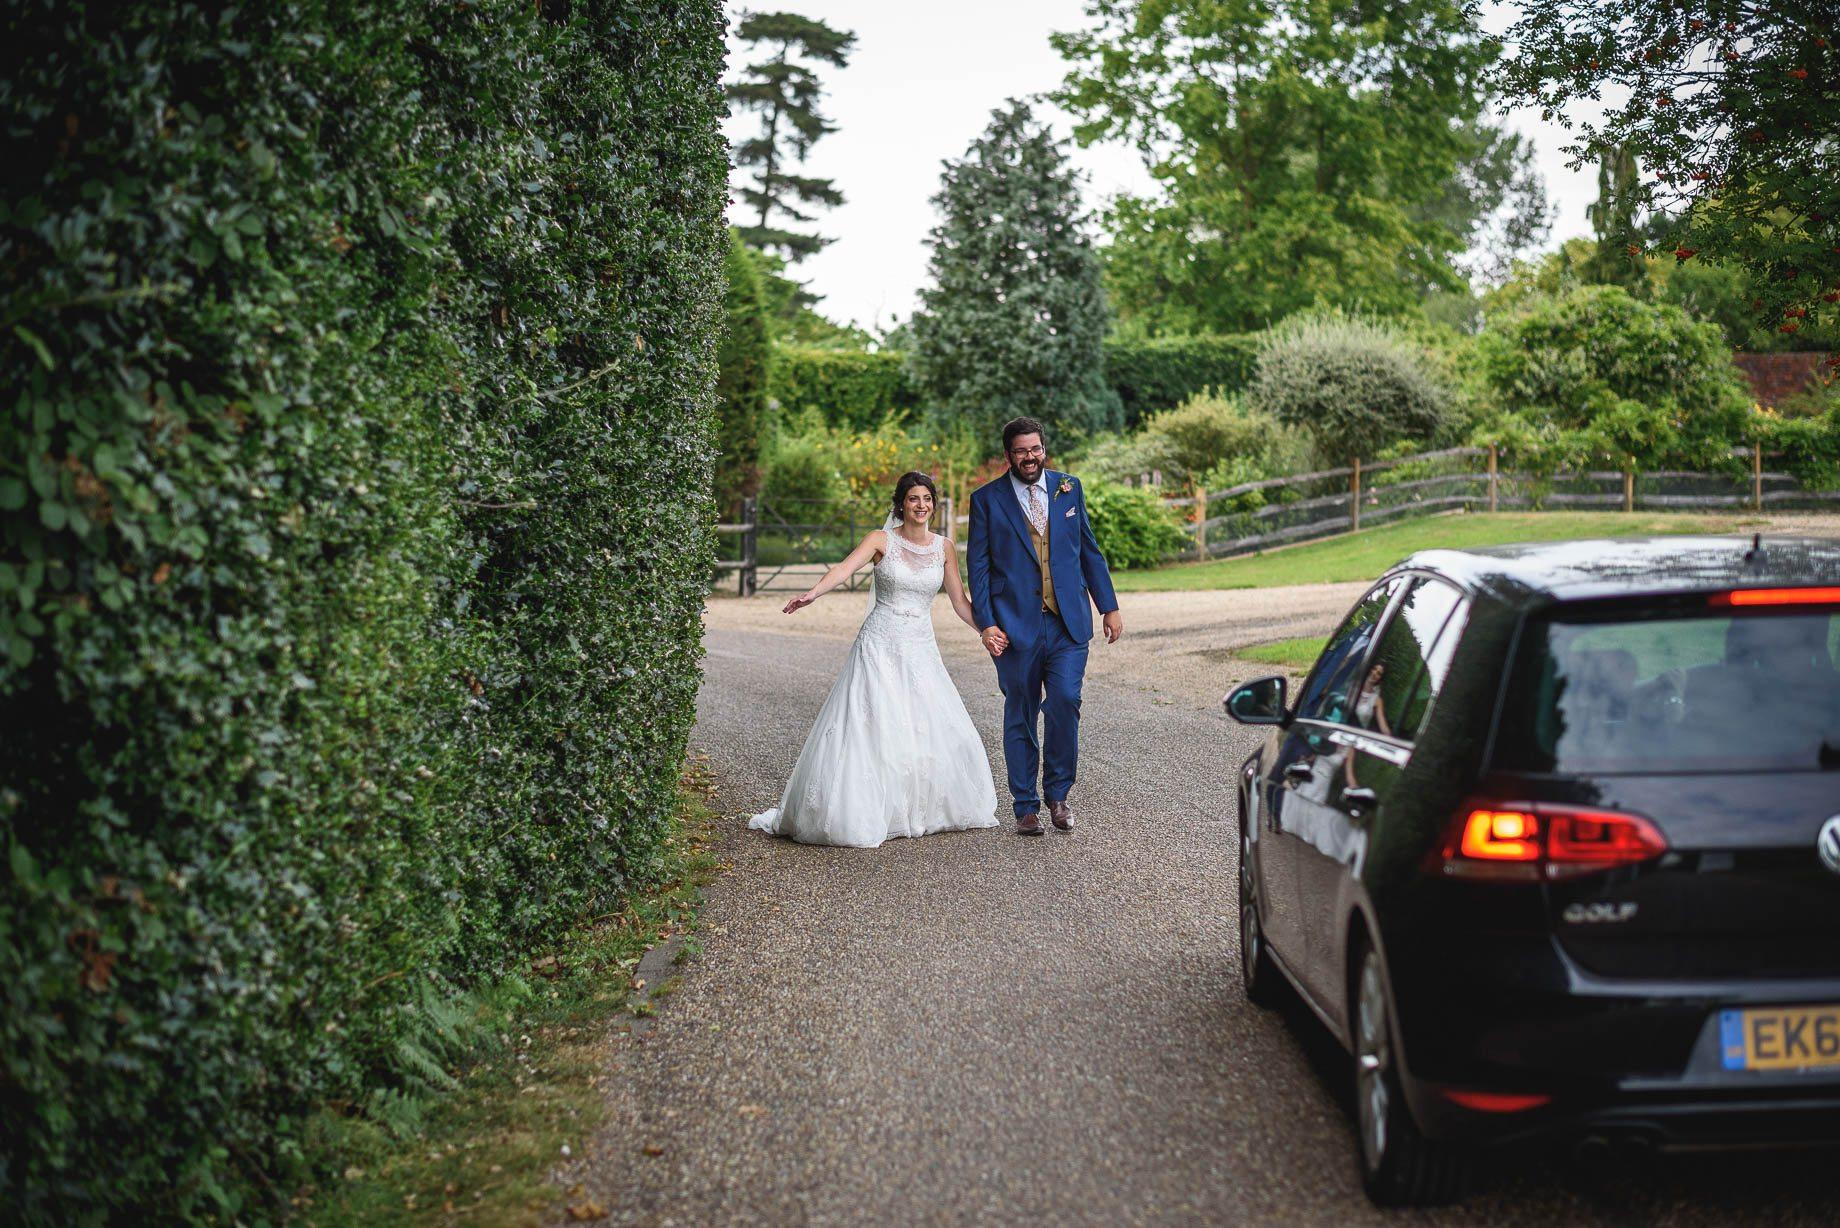 Gaynes Park wedding photography - Guy Collier Photography - Rachel and Jon (143 of 169)